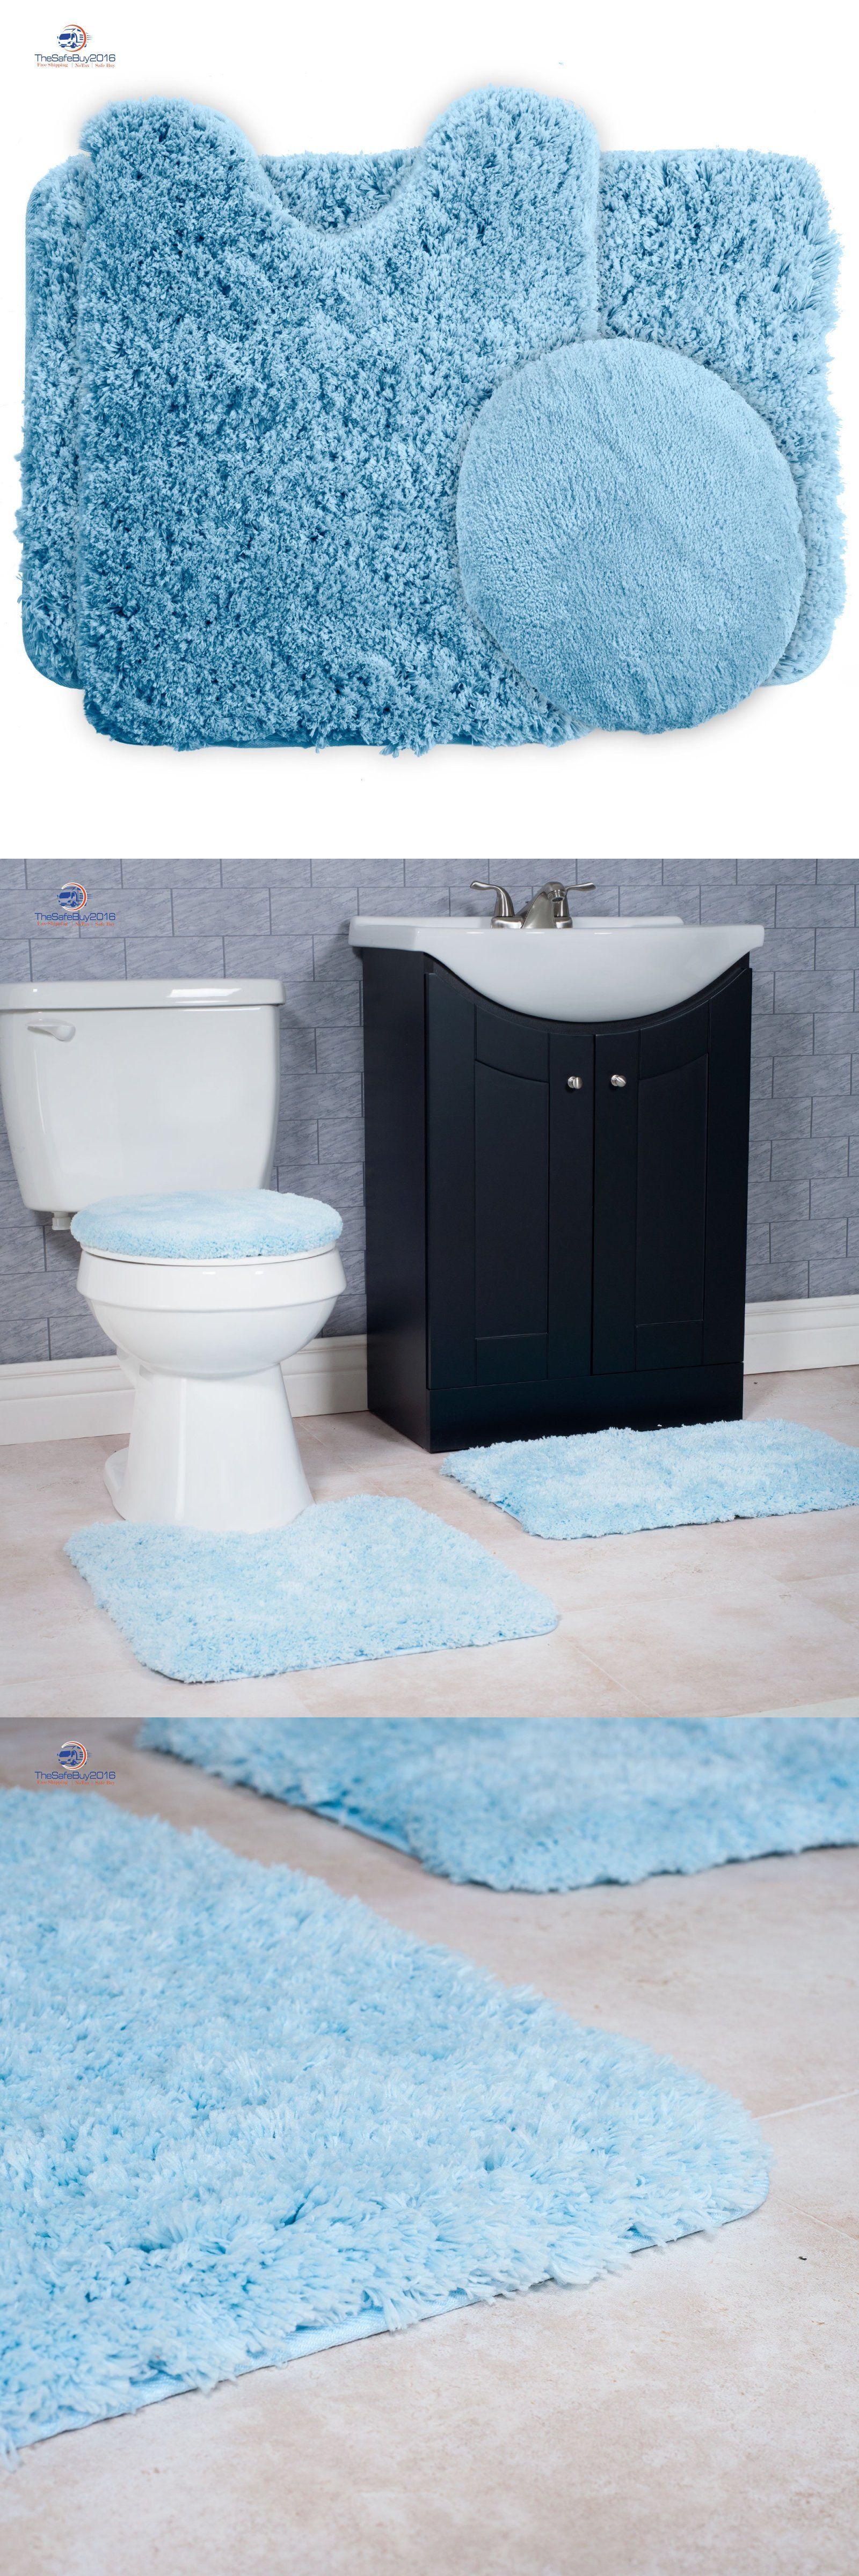 Bathmats Rugs and Toilet Covers 133696: Super Plush Non-Slip Bath ...